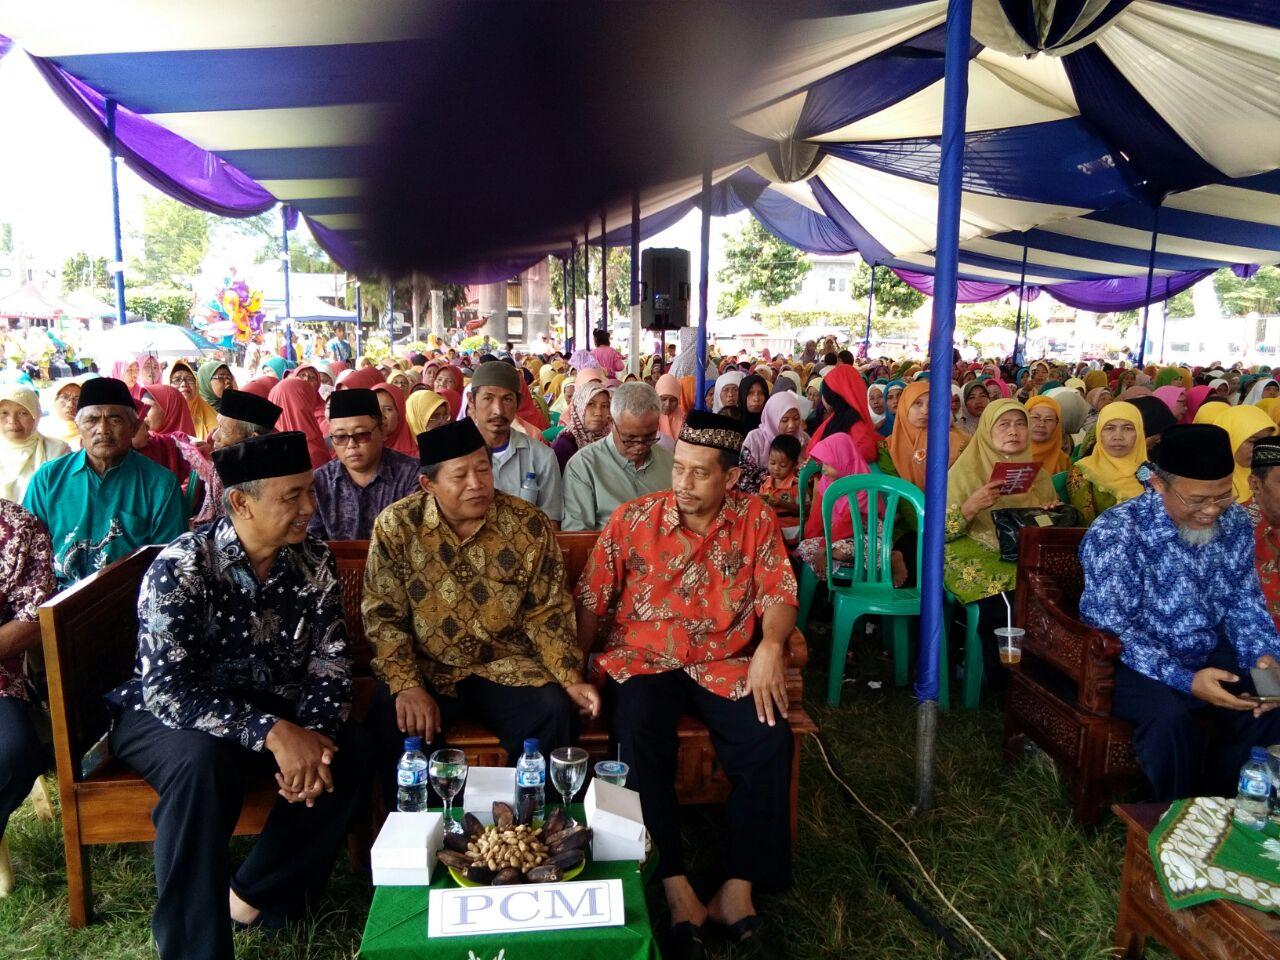 Wisata Dakwah Pd Aisiyah Cilacap Berita Jawa Tengah Kab Pengisi